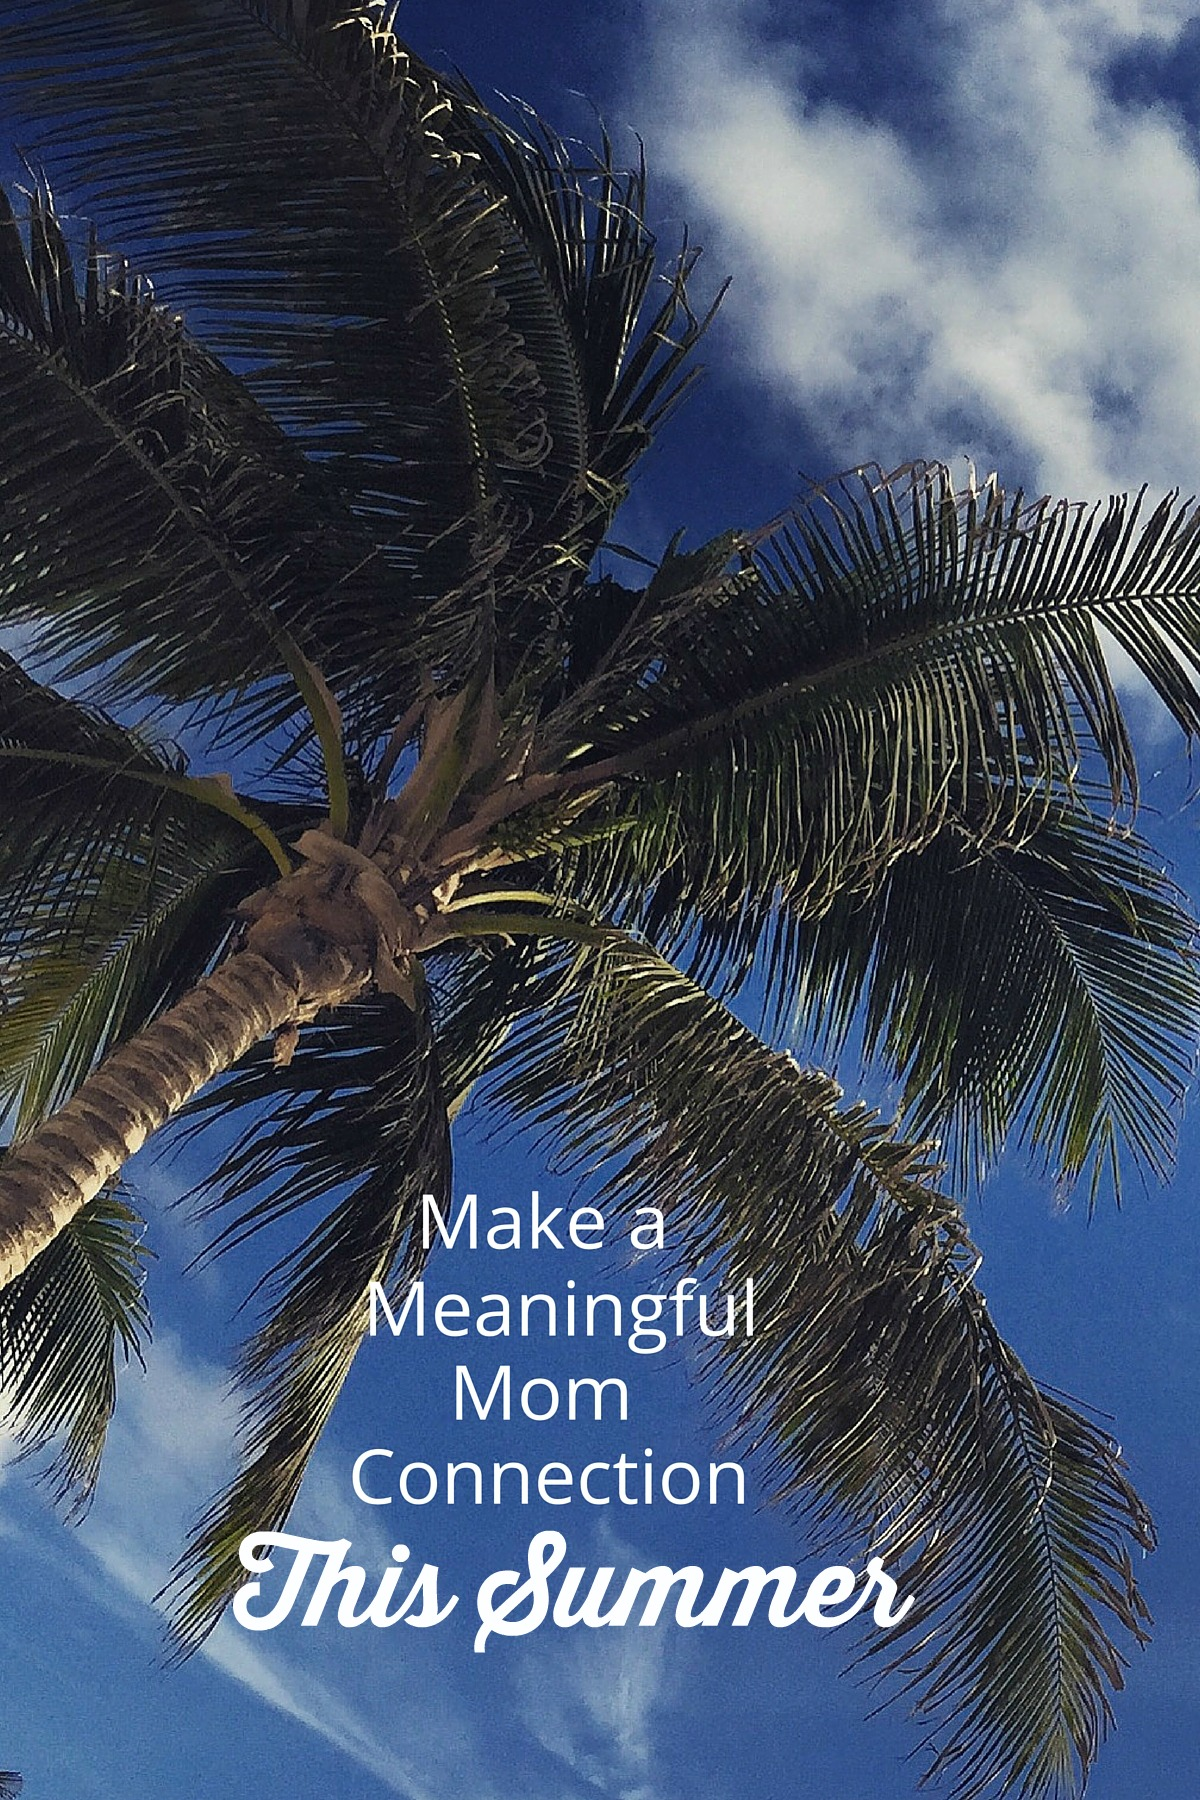 Palm-tree-pin